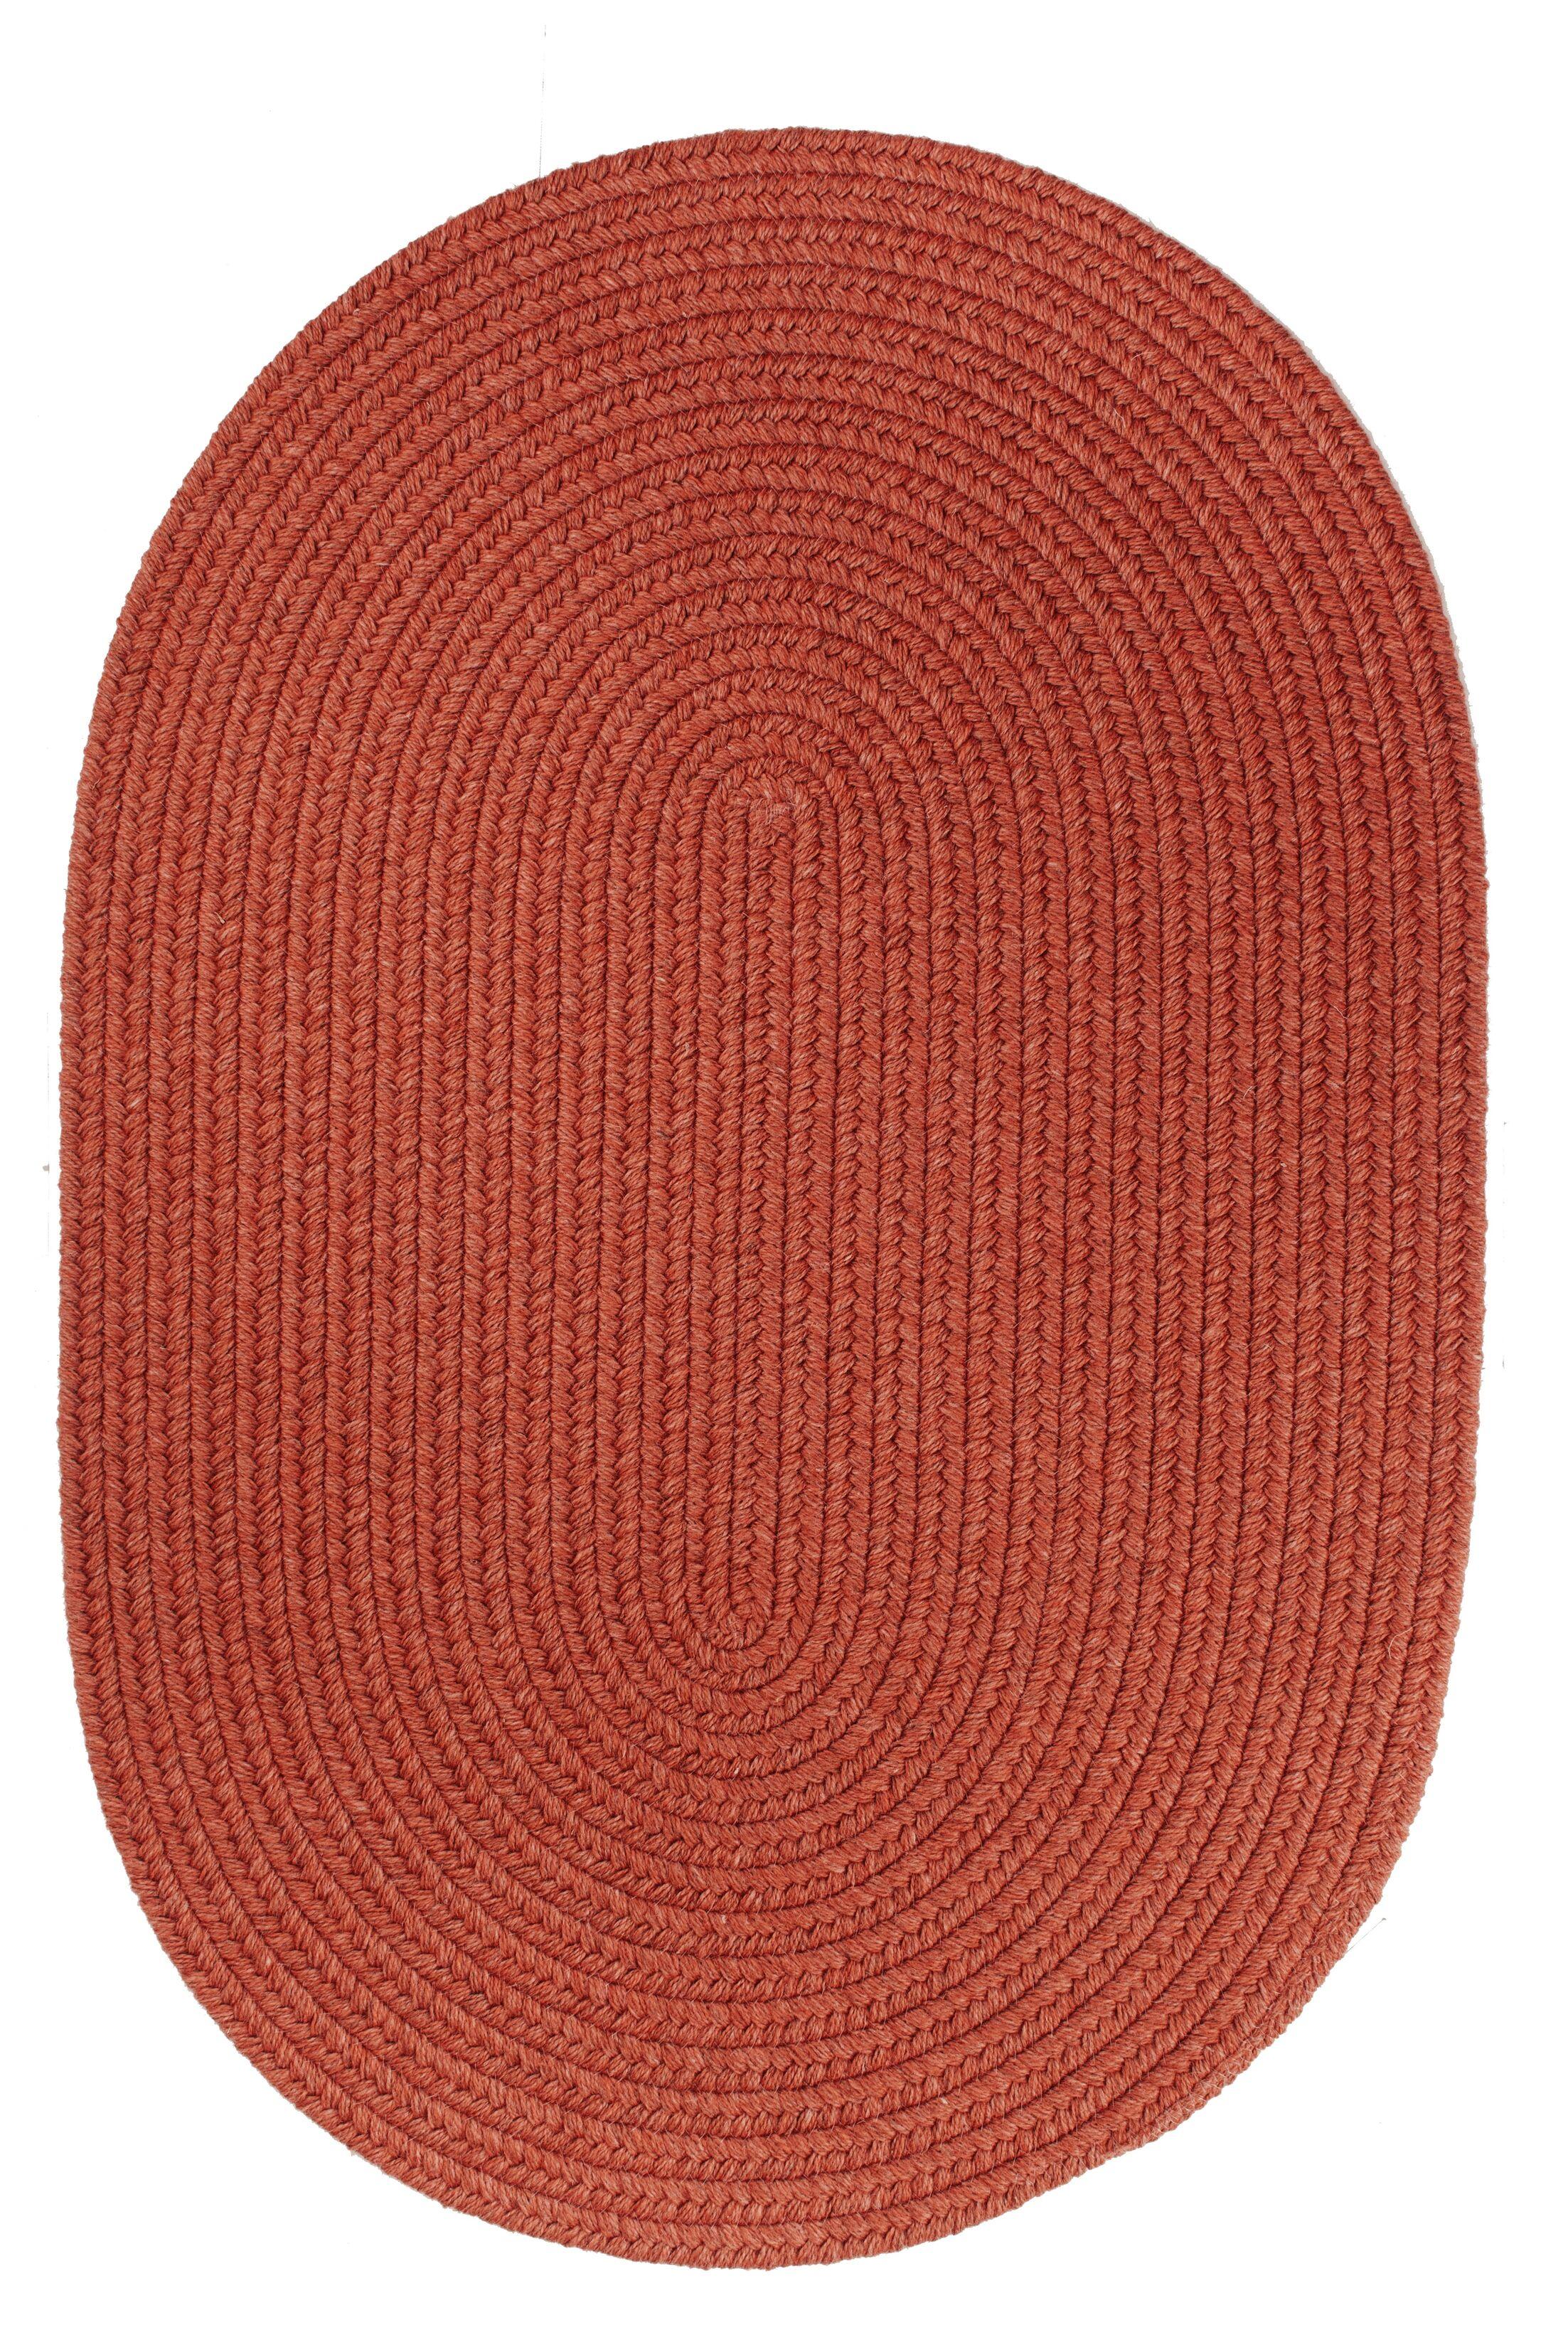 Handmade Terra Cotta Area Rug Rug Size: Oval  8' x 11'